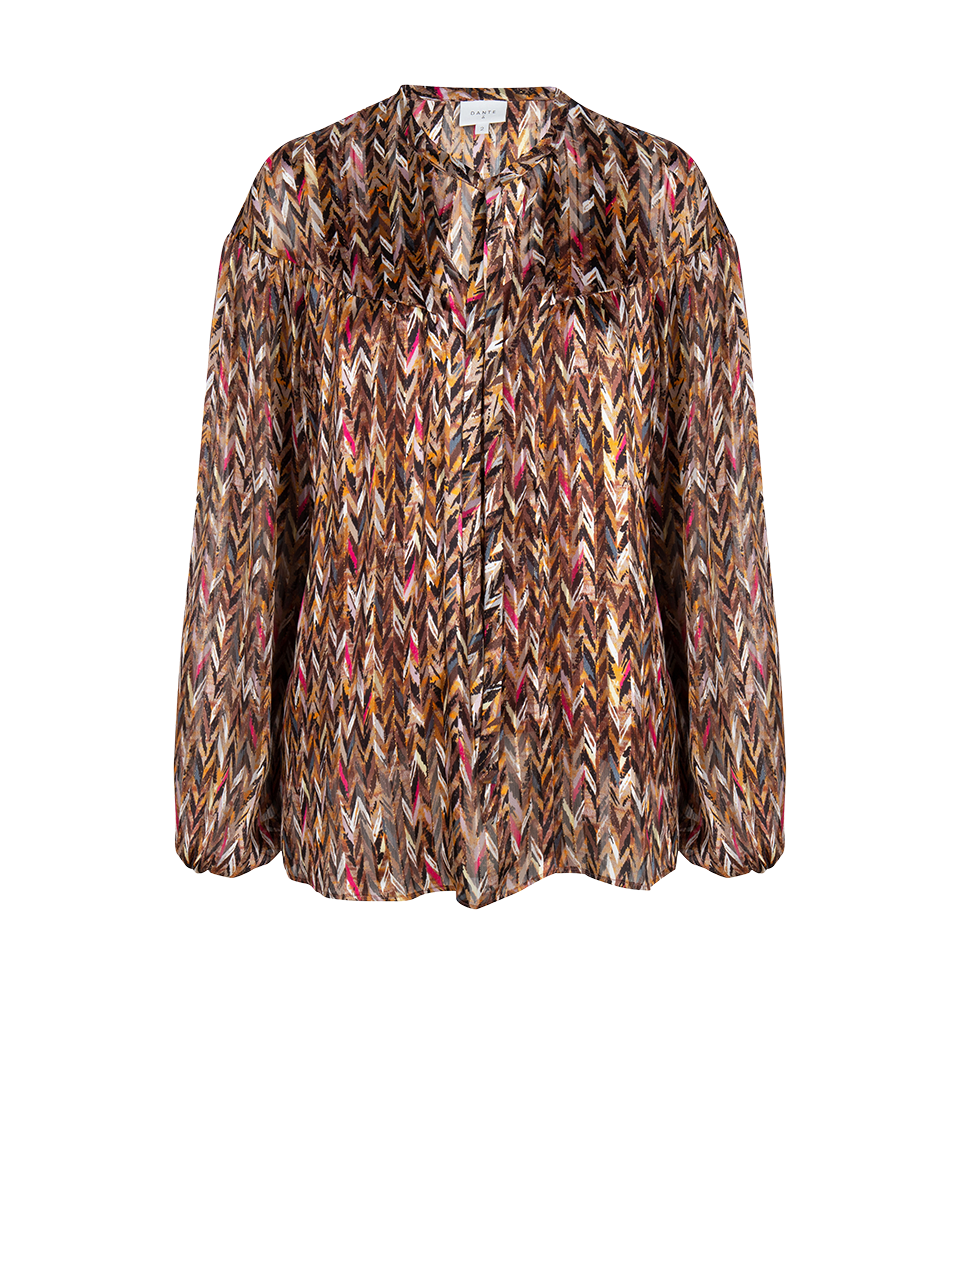 June printed chevron blouse-1